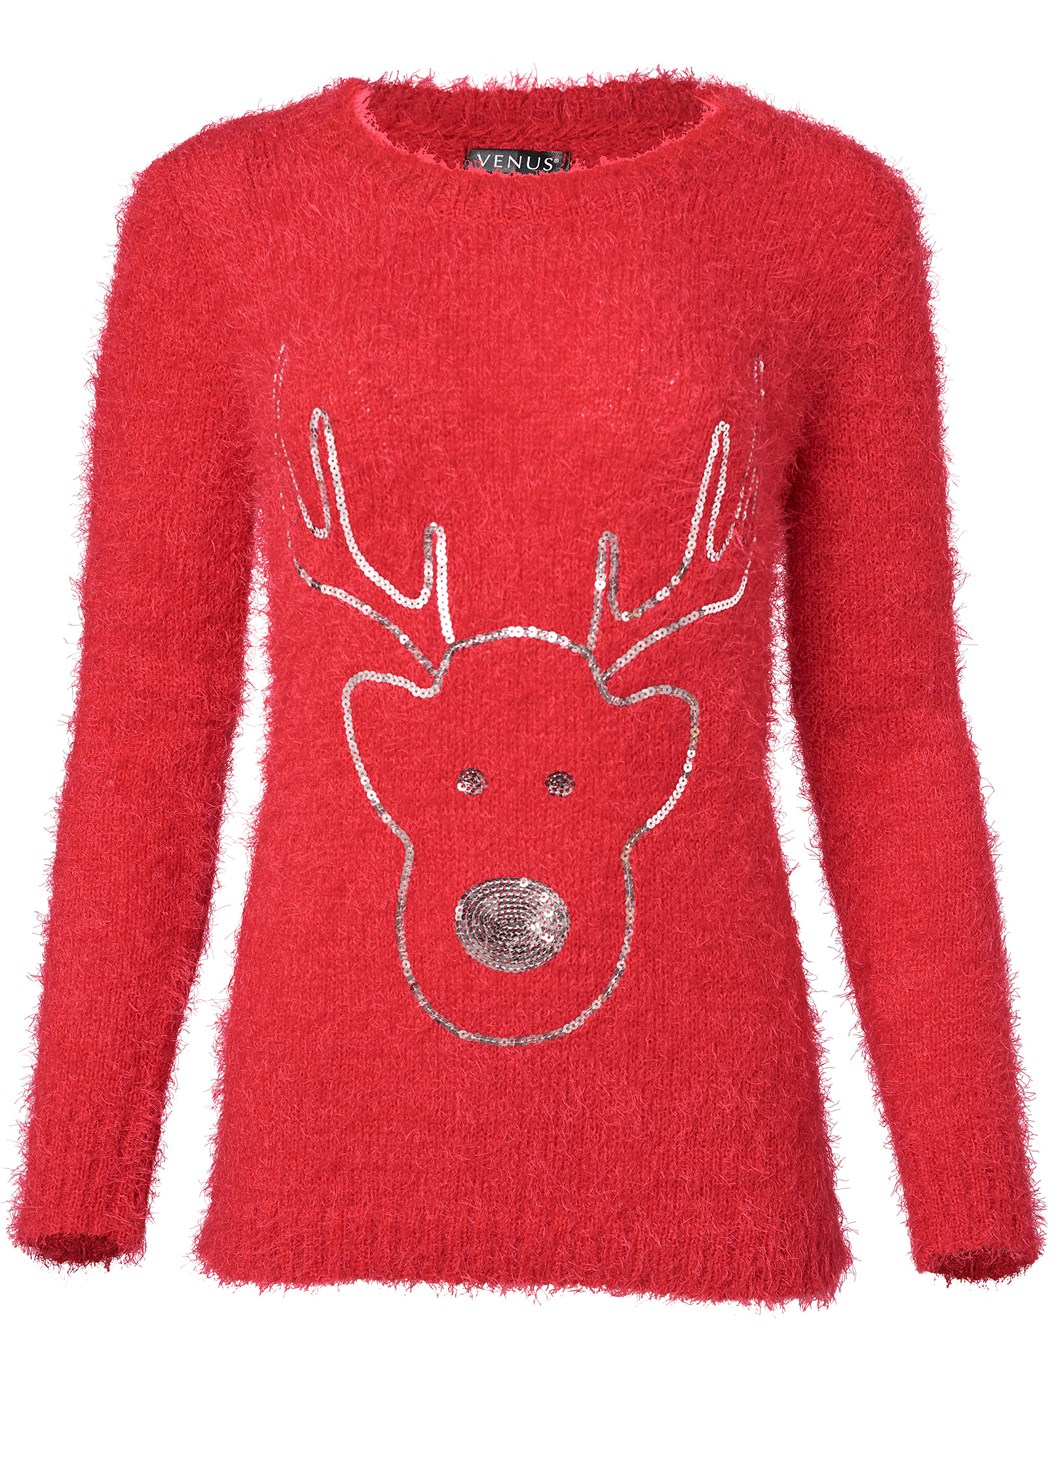 Reindeer Sweater,Casual Bootcut Jeans,Knee High Block Heel Boot